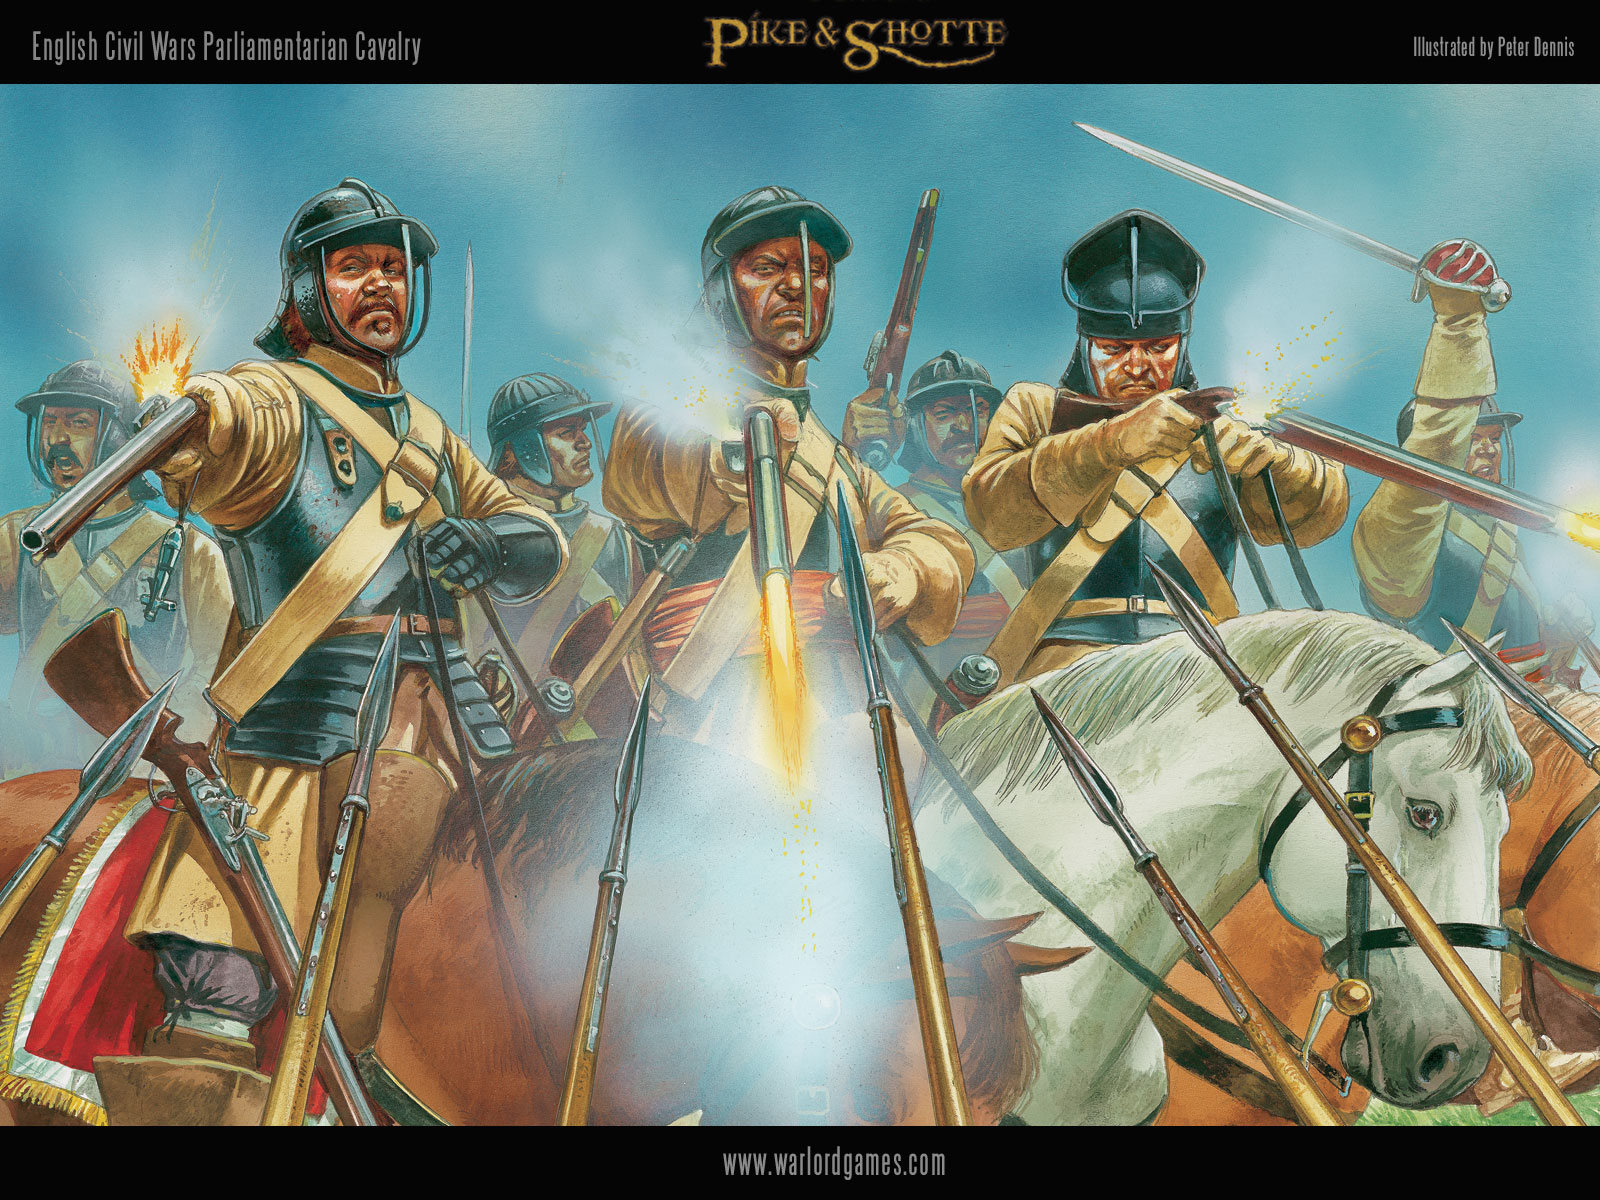 Illustrations P&S ECW-Parliament-Cavalry-wallpaper